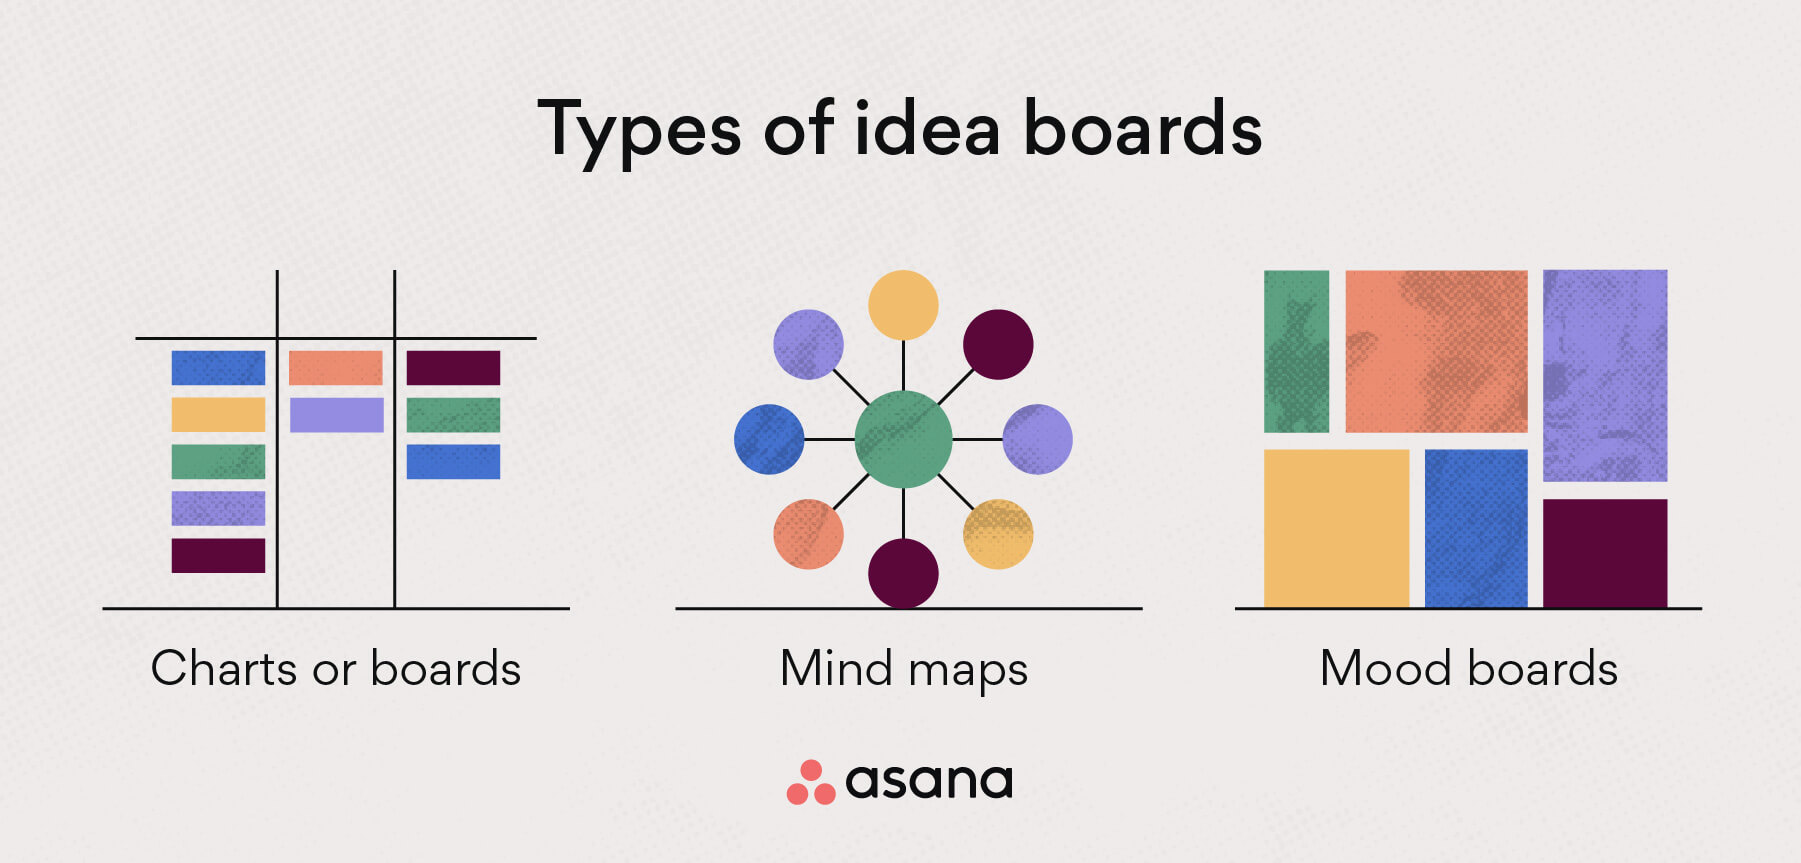 Types of idea boards